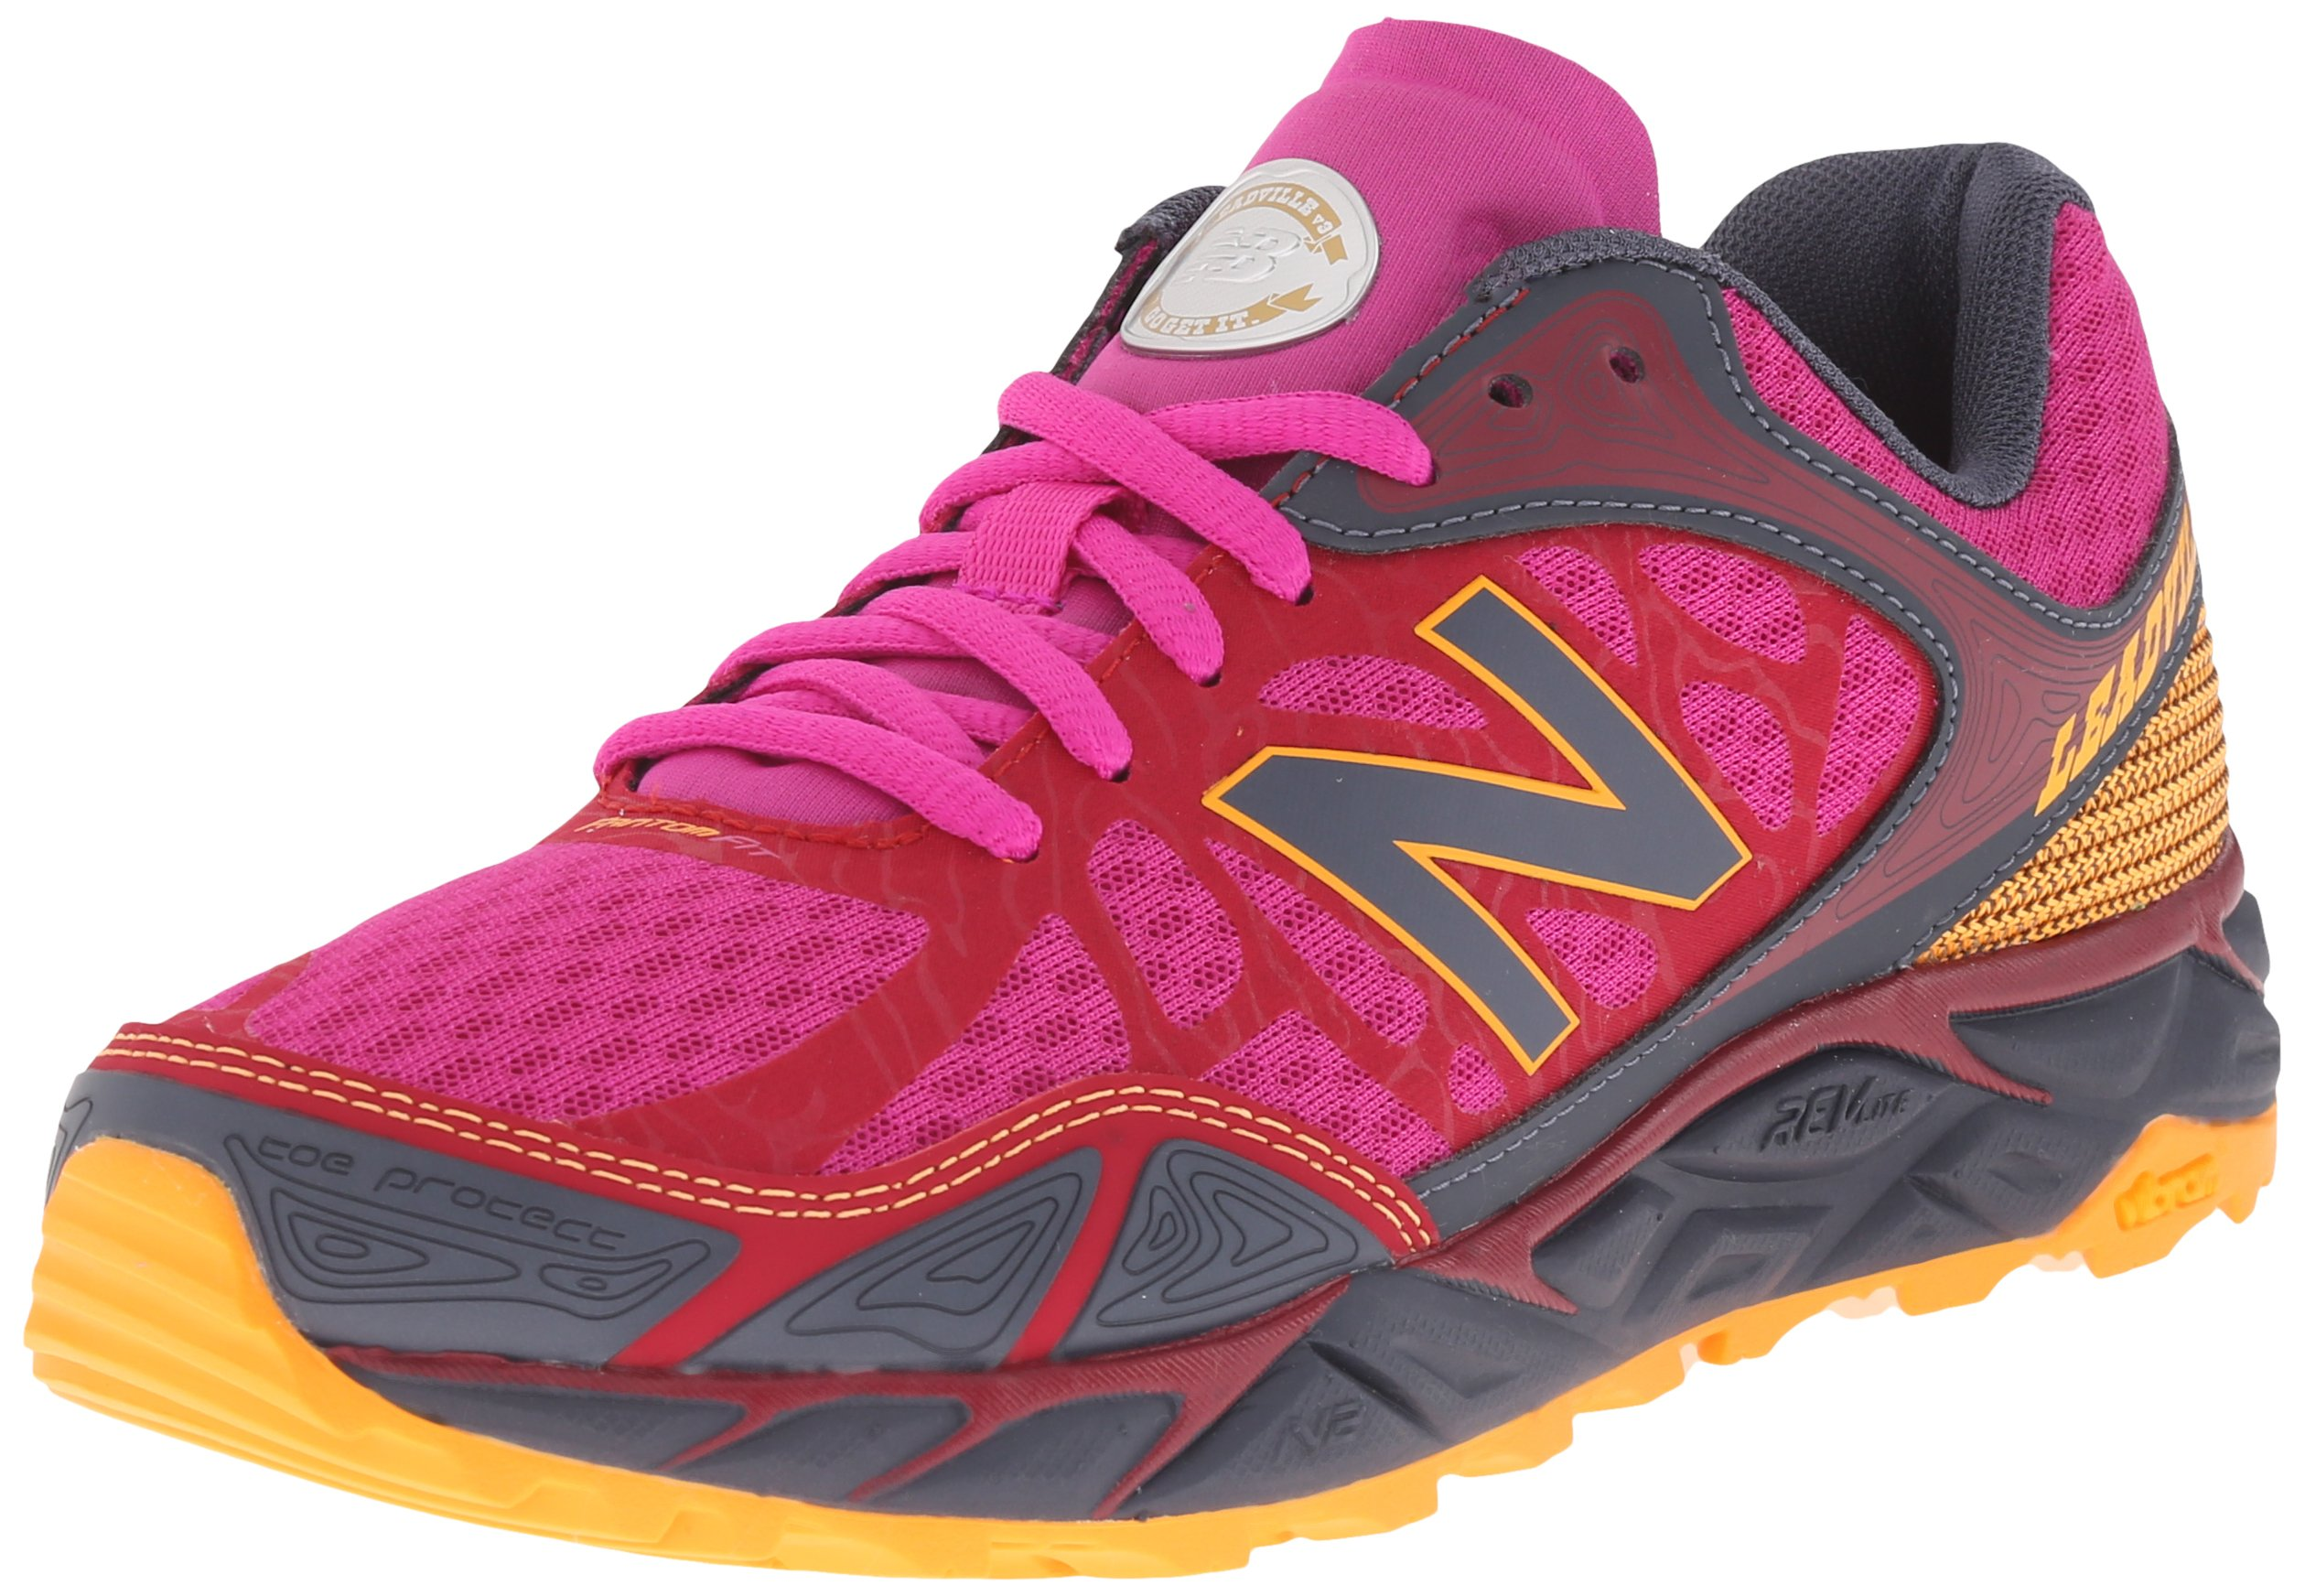 New Balance Women's Leadvillev3 Trail Shoe, Pink/Grey, 6 B US